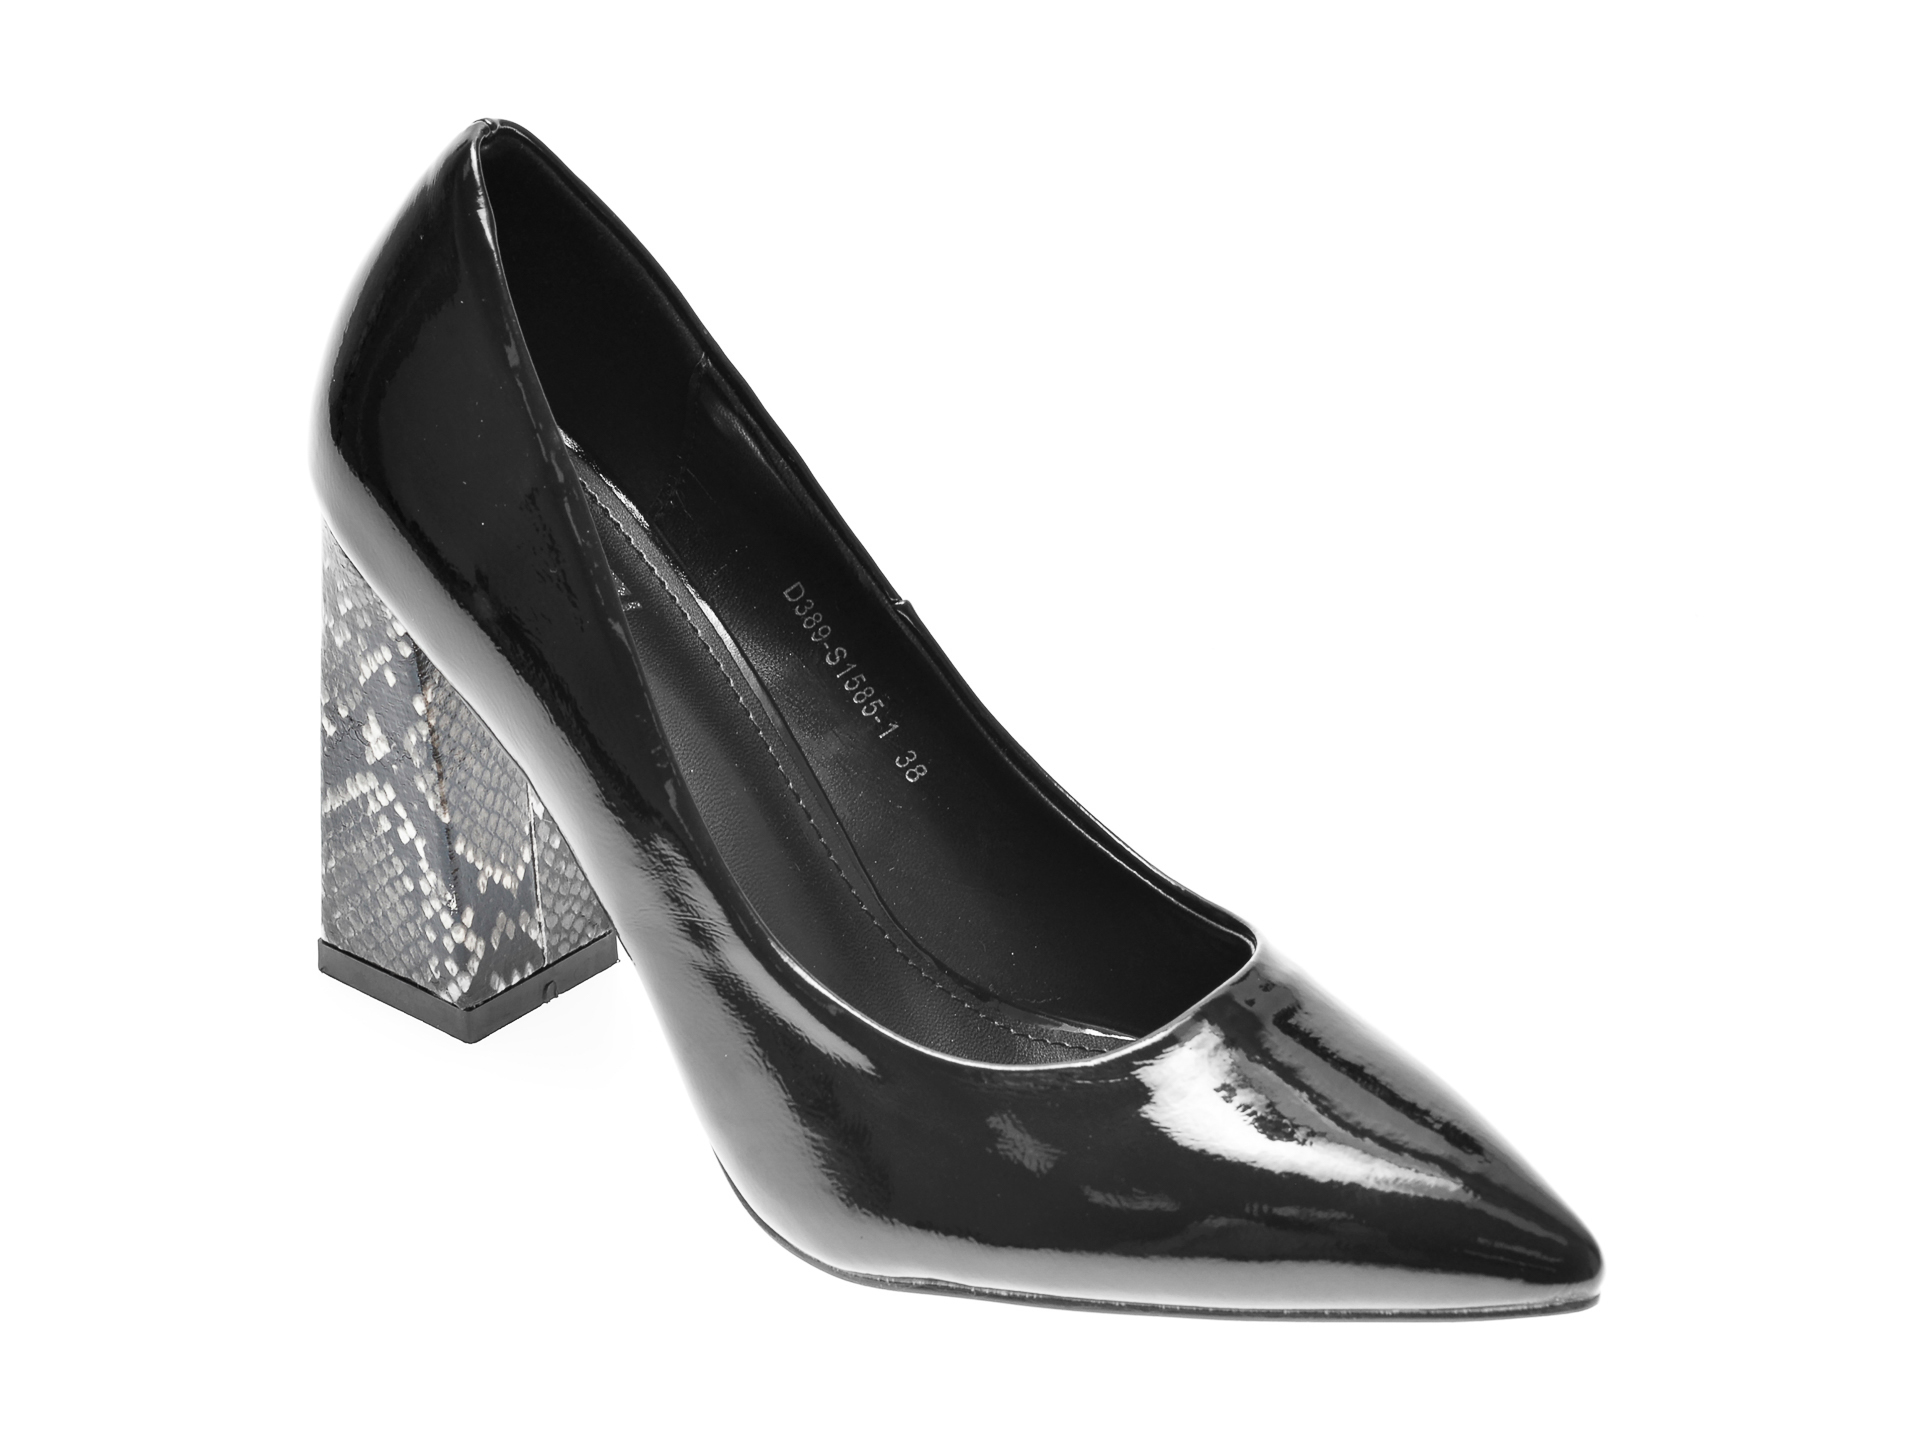 Pantofi Rio Fiore Negri, S1585, Din Piele Ecologica